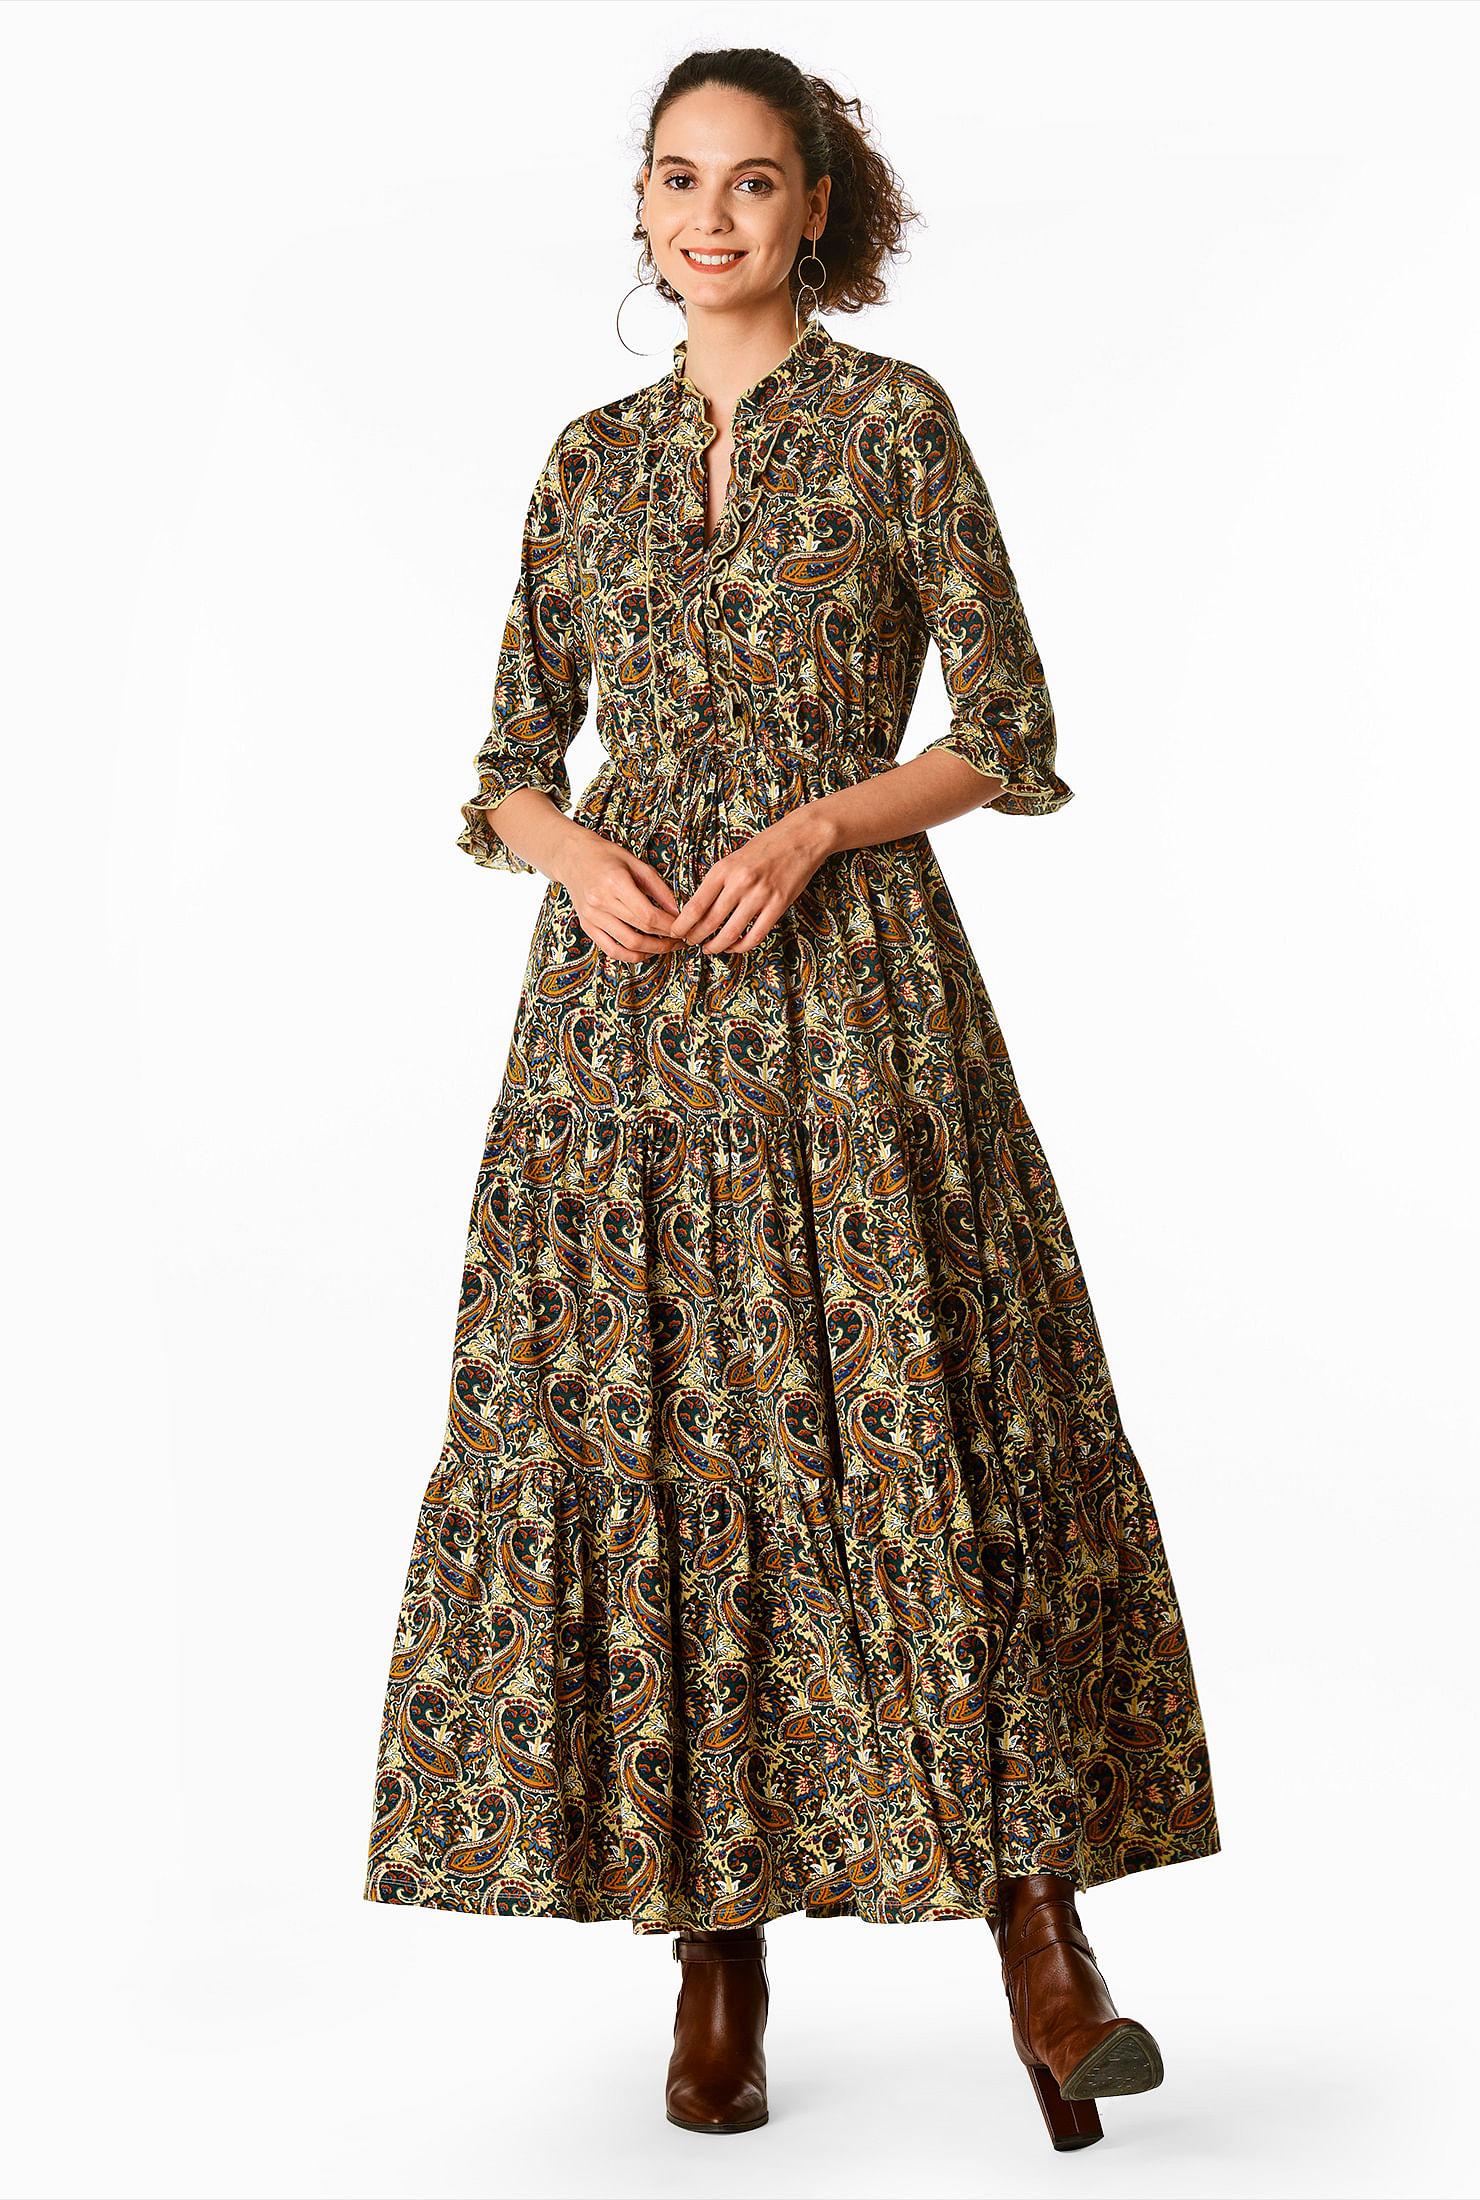 70s Dresses – Disco Dress, Hippie Dress, Wrap Dress Ruffle tier paisley print knit shirtdress $64.95 AT vintagedancer.com